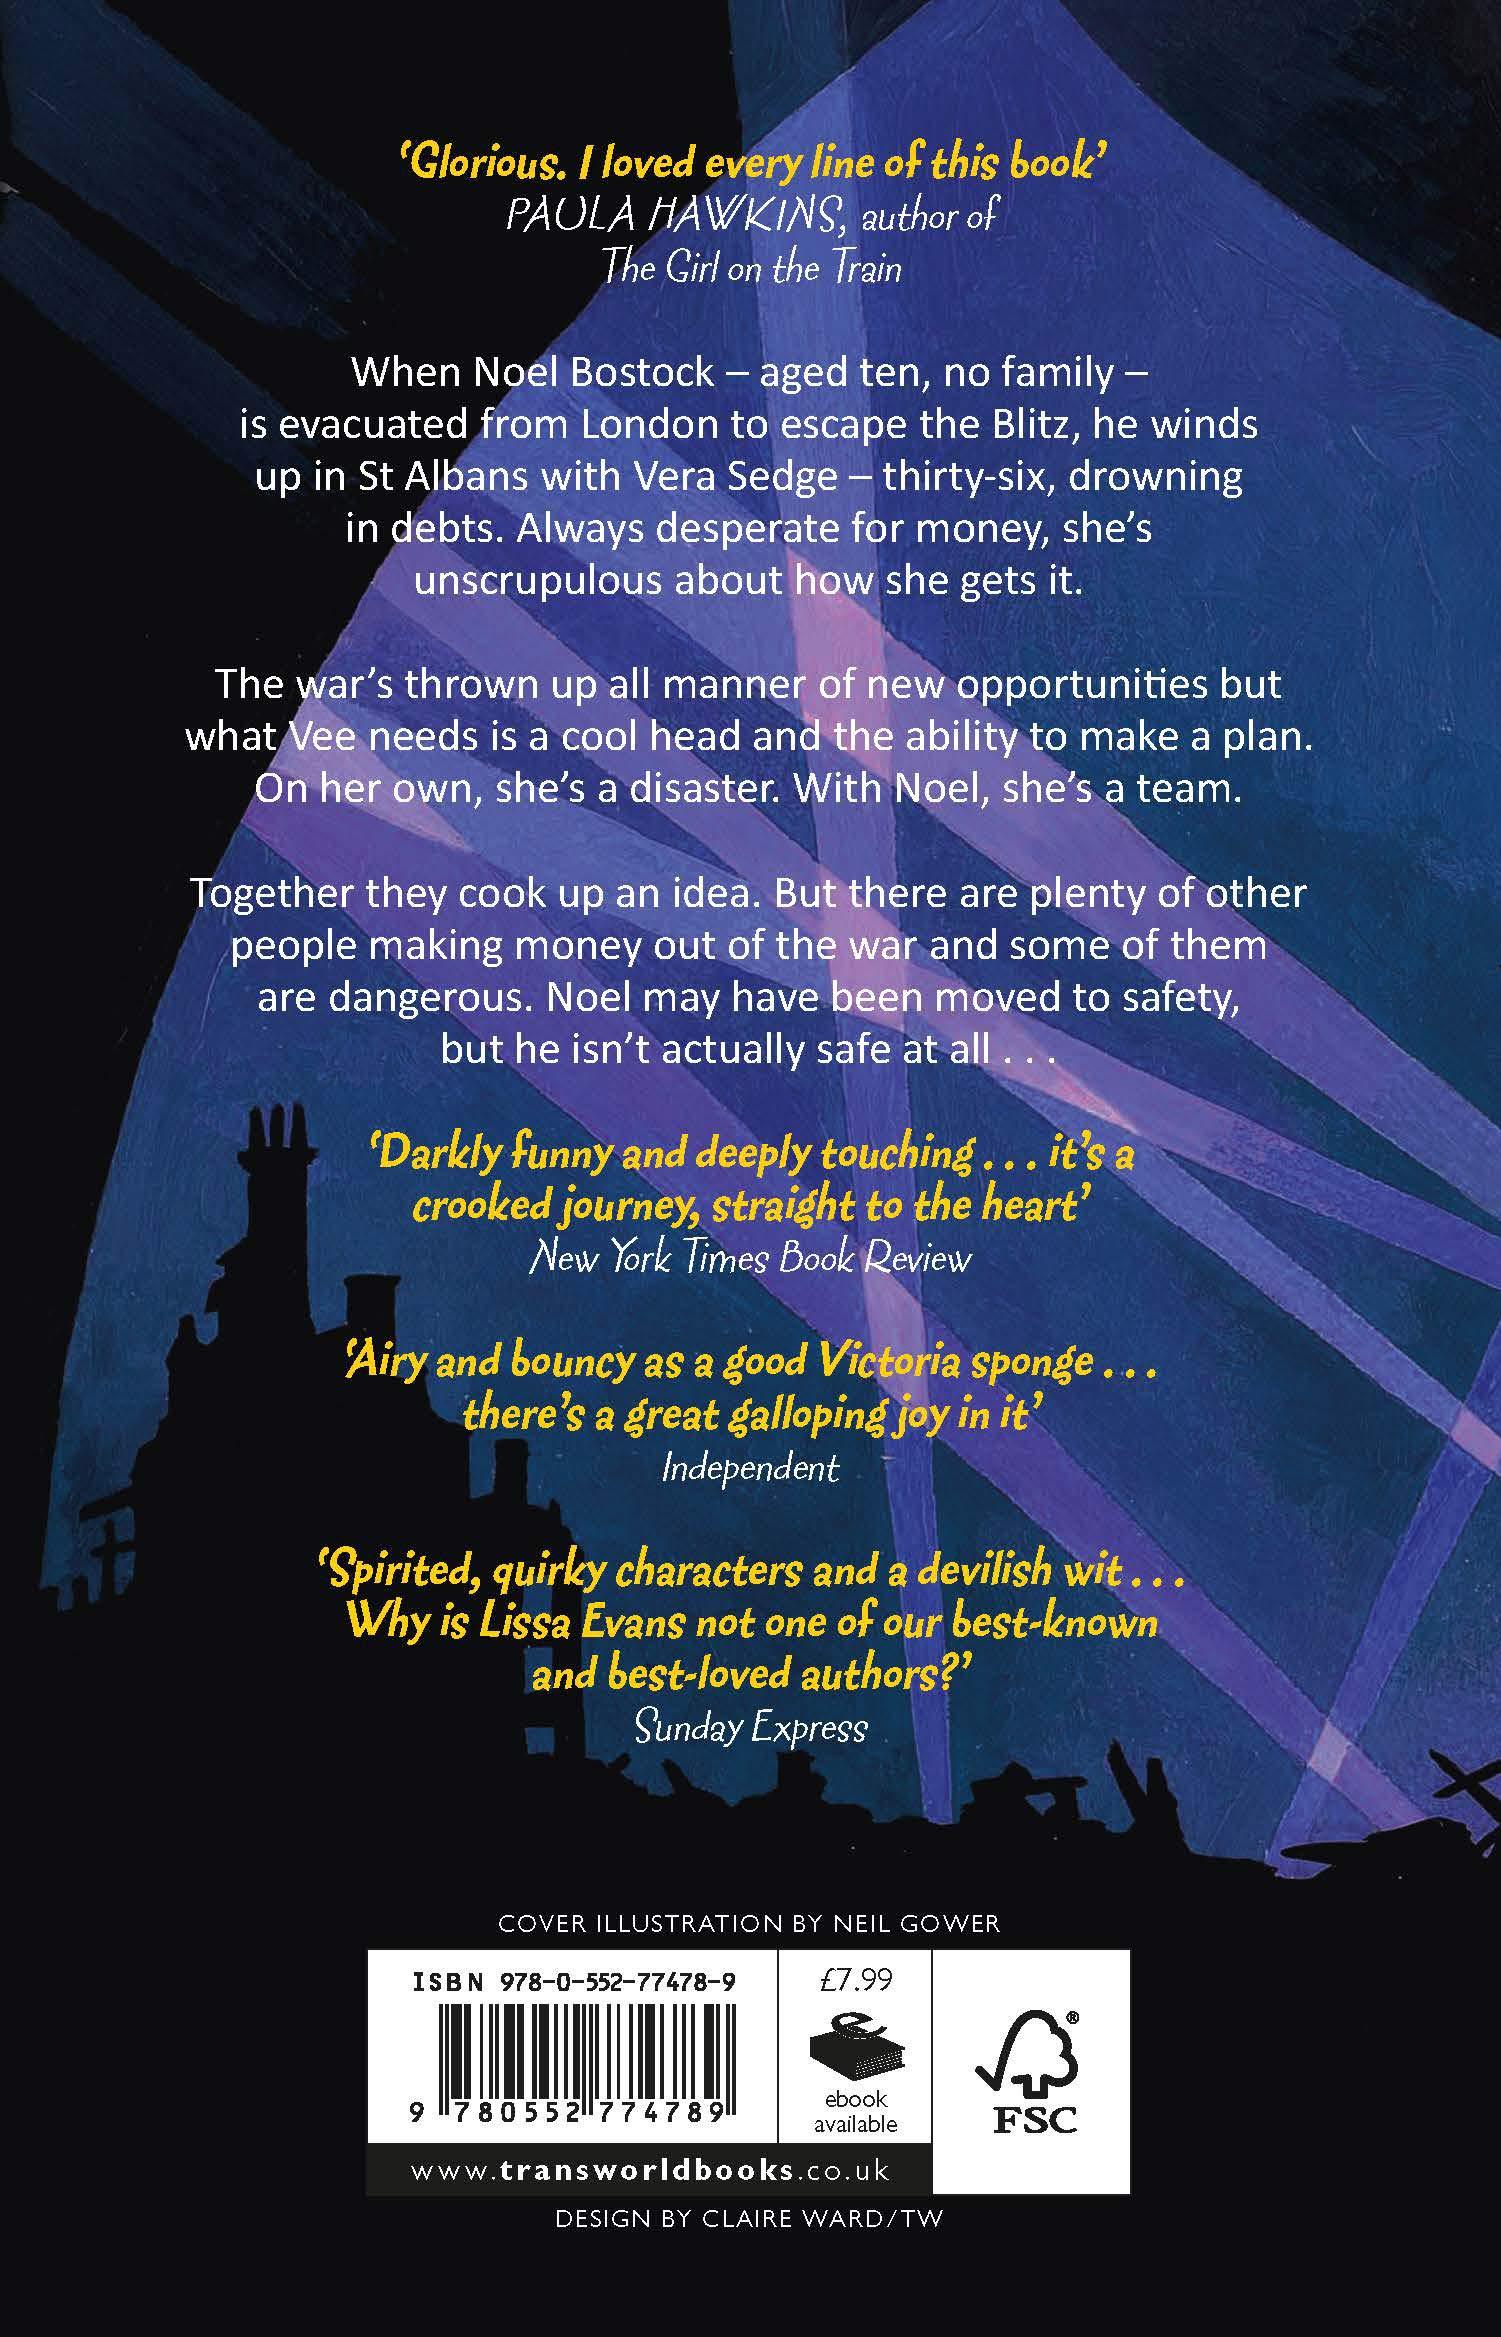 Crooked Heart: 'My book of the year' Jojo Moyes: Amazon.co.uk: Lissa Evans:  9780552774789: Books